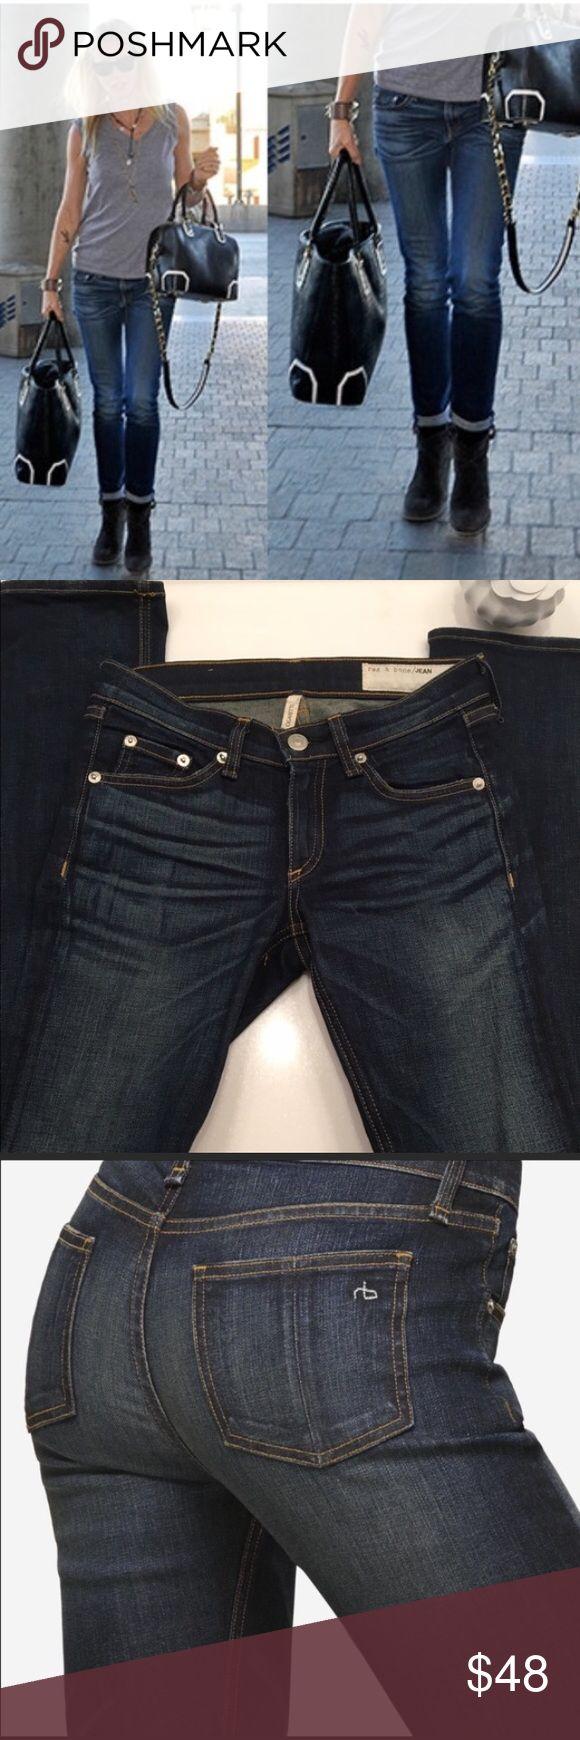 "Rag & Bone Cigarette Jean Cigarette style jean from Rag & Bone. Size 24. 7.5"" rise and 34"" inseam. Great condition. Skinny through leg. Cute to cuff or leave down. rag & bone Jeans Straight Leg"